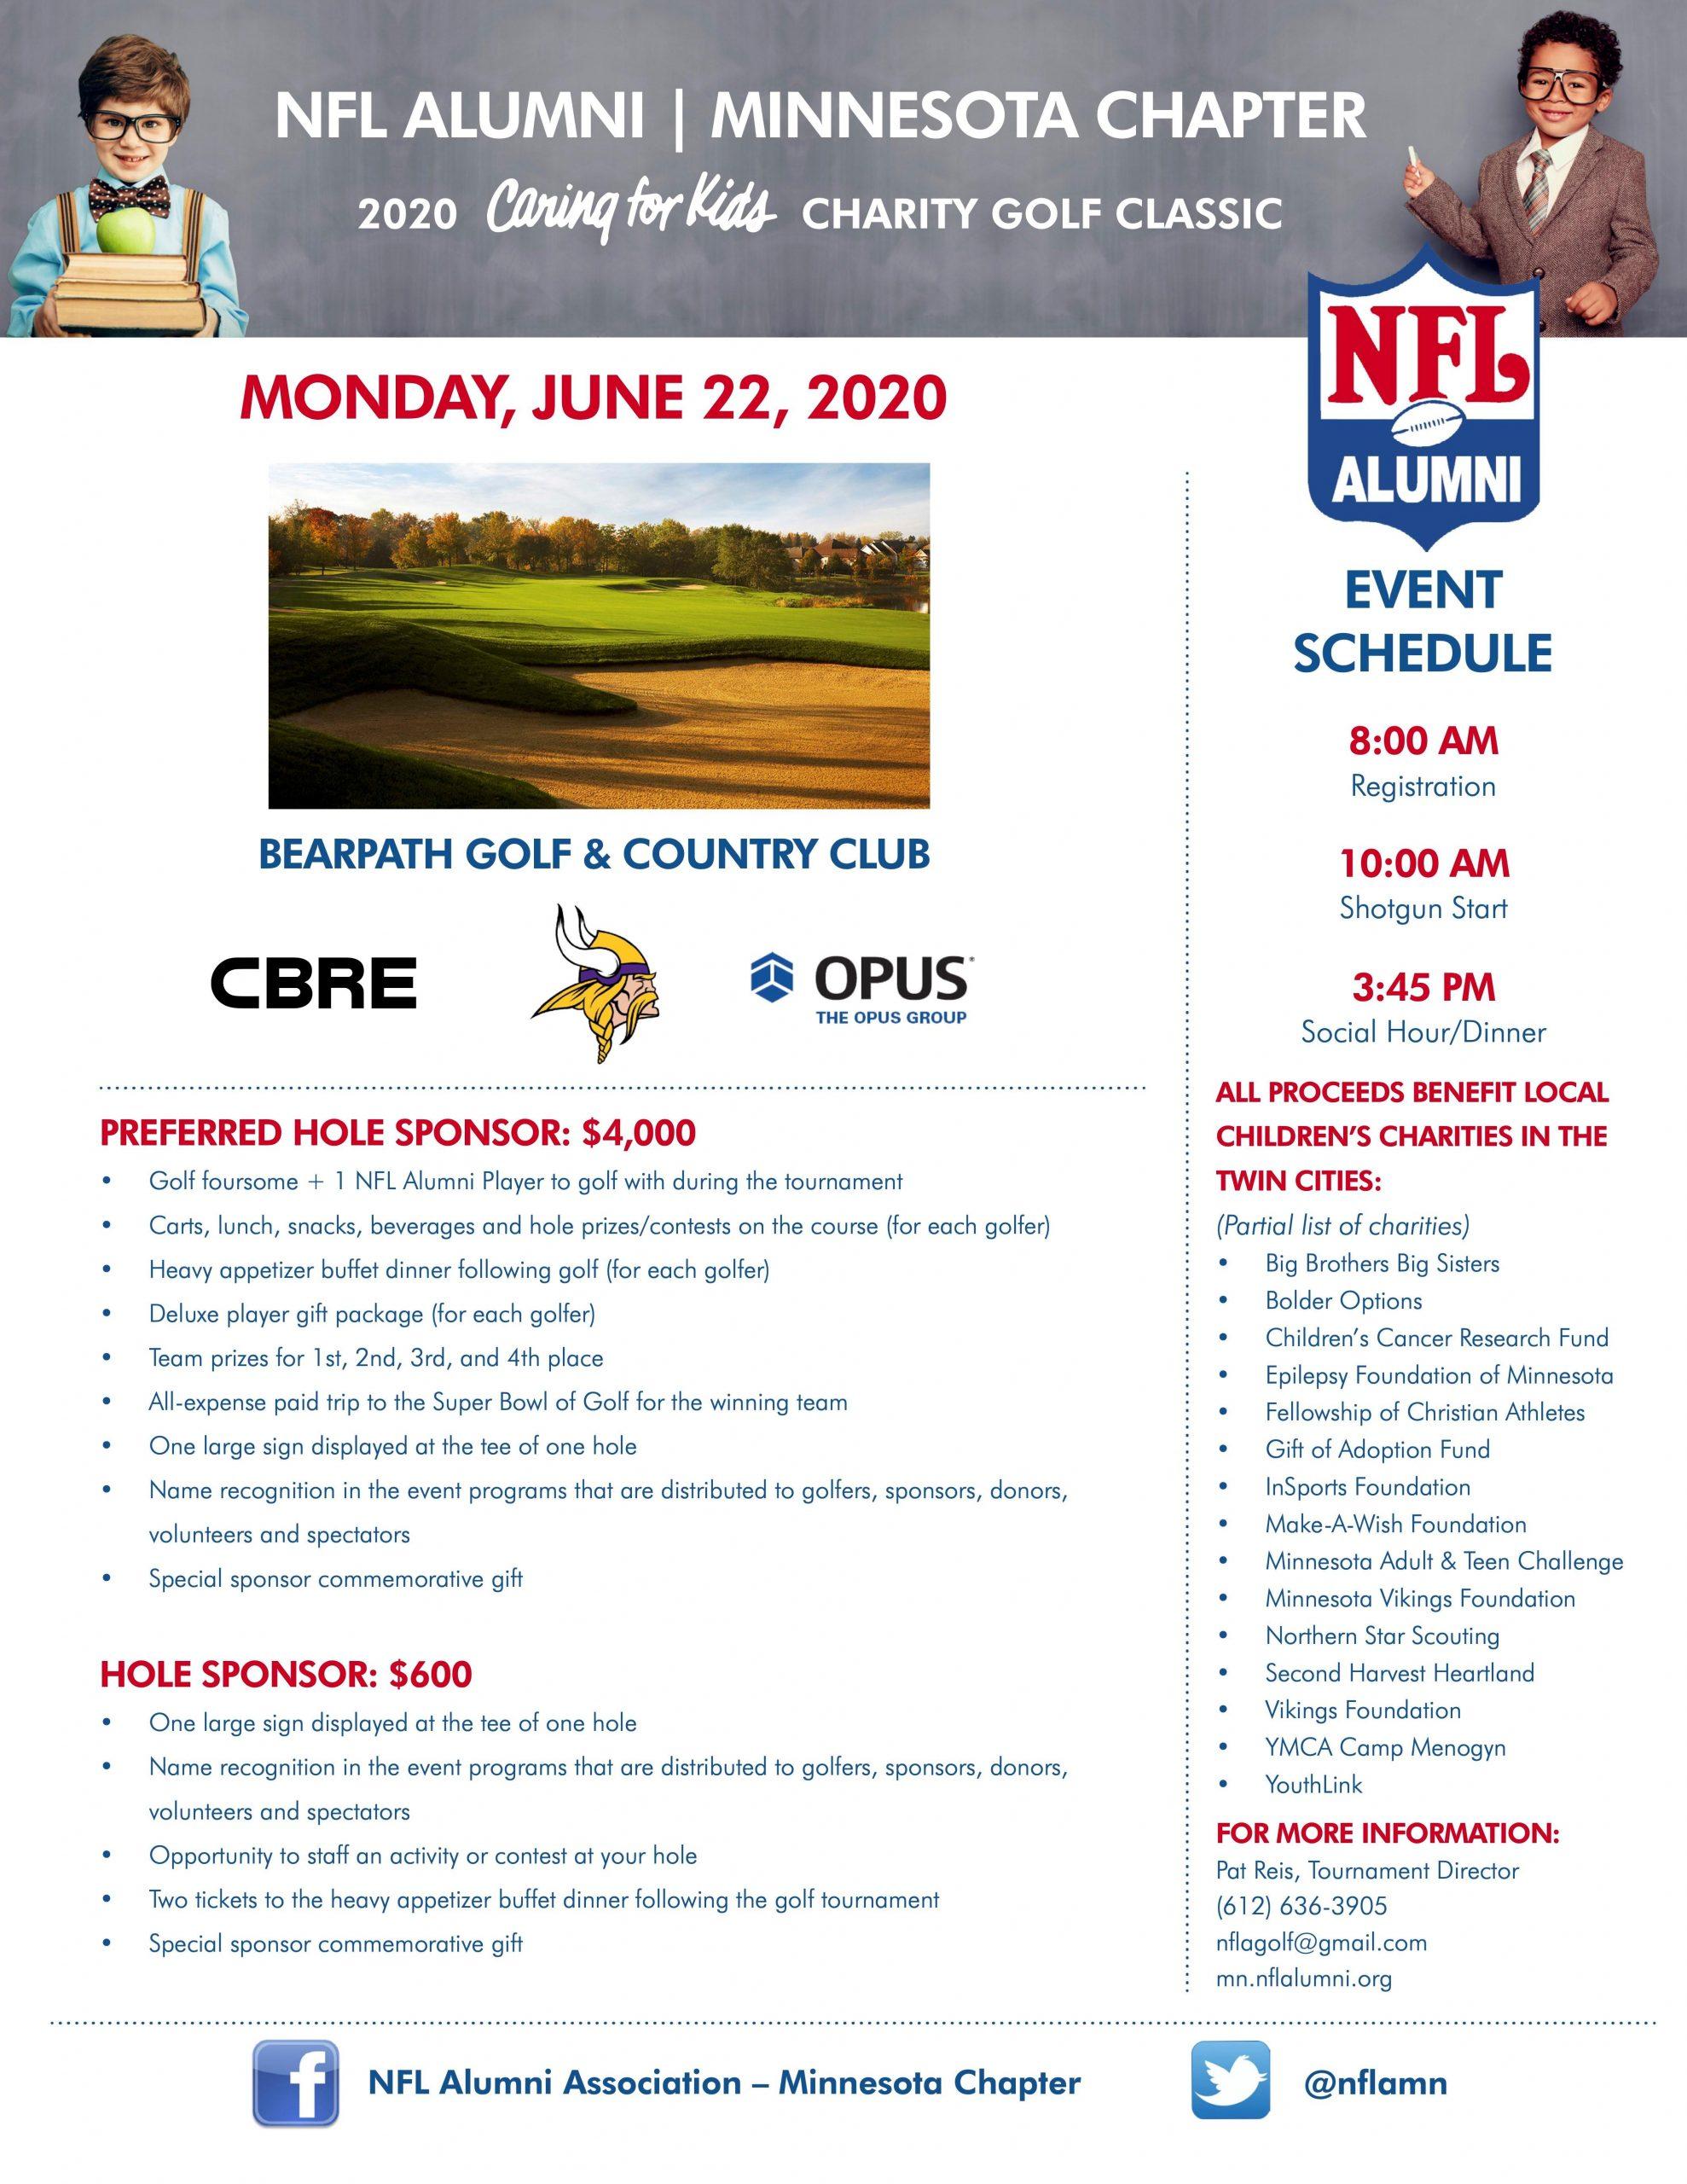 2020 NFL Alumni Minnesota Chapter 'Caring for Kids' Charity Golf Classic